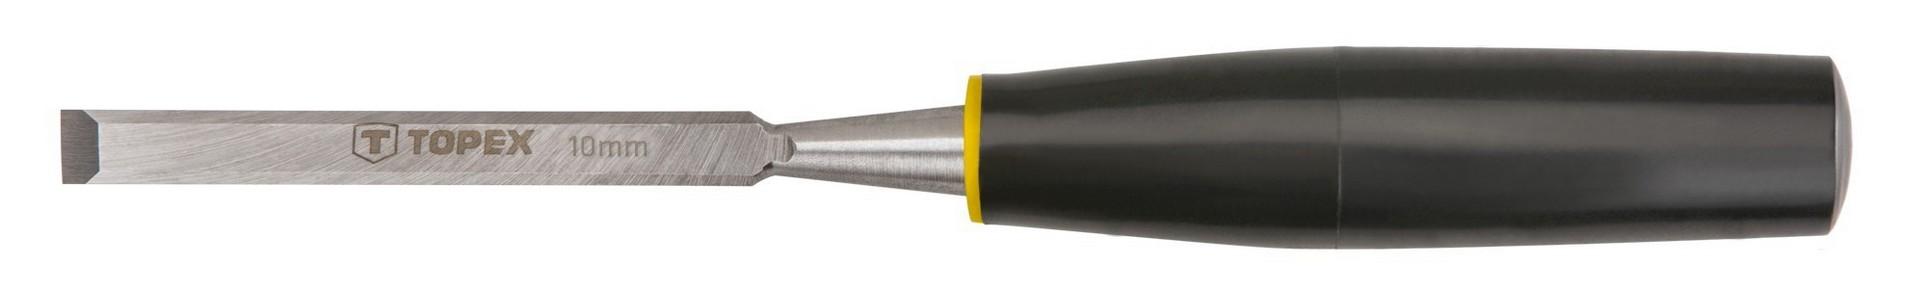 Favésõ 10 mm lapos, mûanyag nyelû | TOPEX 09A110